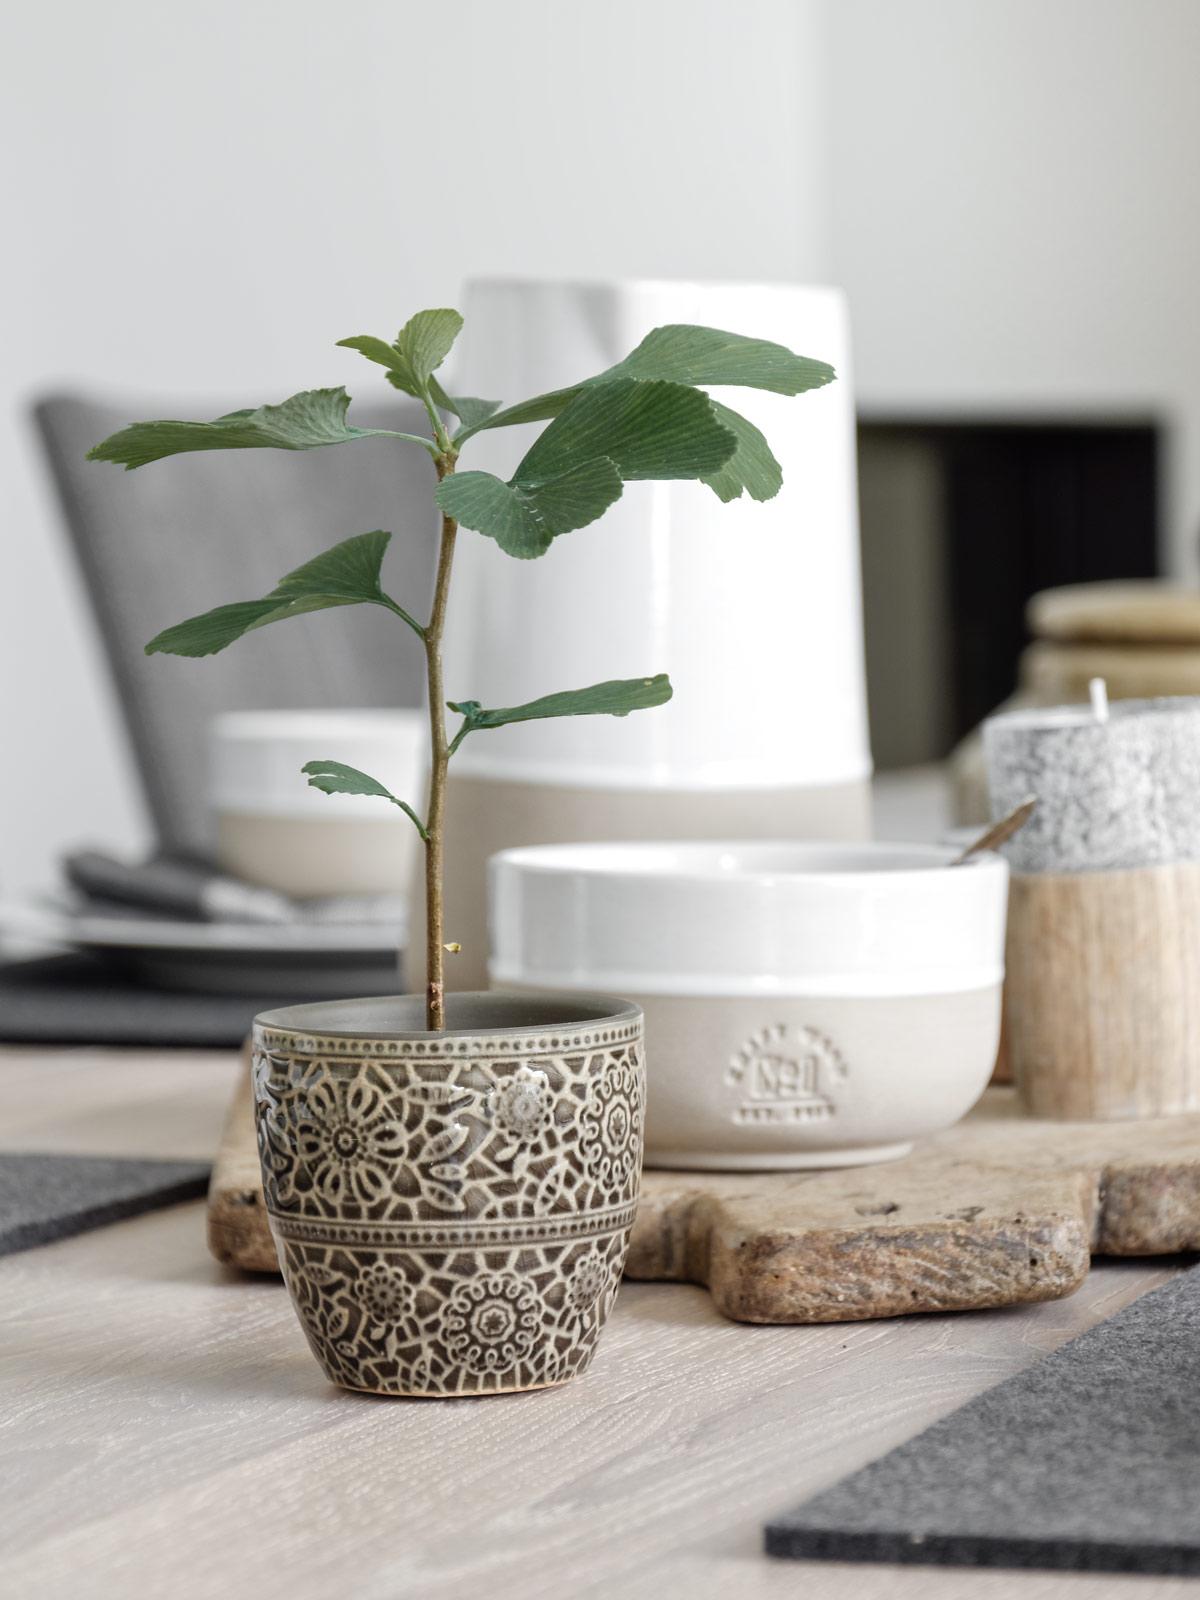 dekoration natur pur auf dem esstisch mxliving. Black Bedroom Furniture Sets. Home Design Ideas